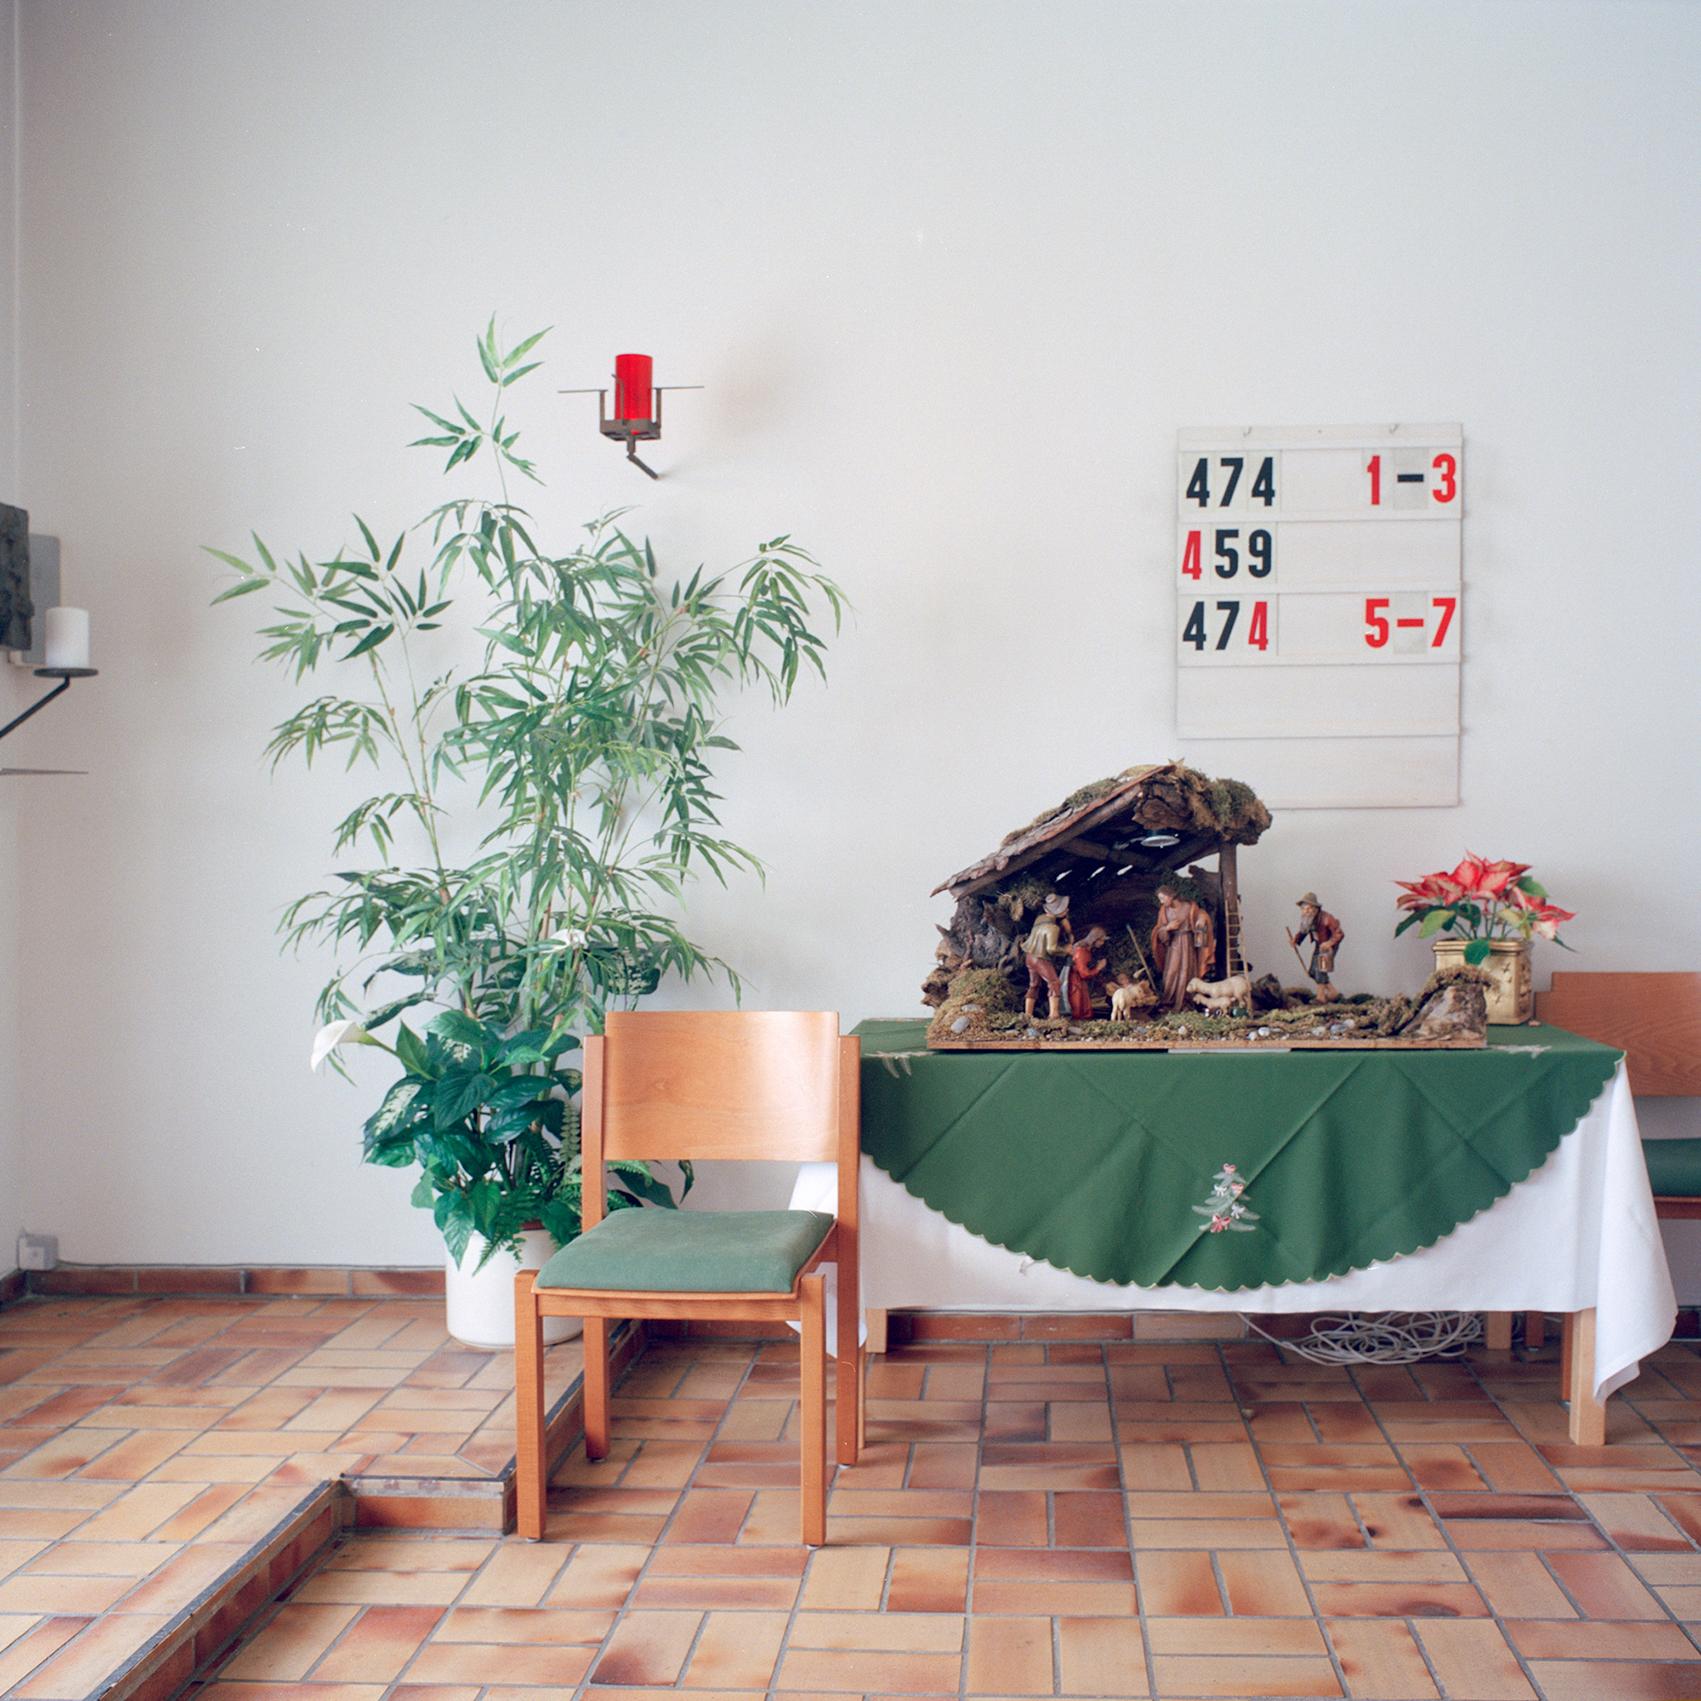 Georg Brauchle Haus, Muenchen. Innenraum in der Kapelle im Georg Brauchle Haus in der Staudingerstrasse 58 in Muenchen am 18. Januar 2011. Fotograf: Evi Lemberger